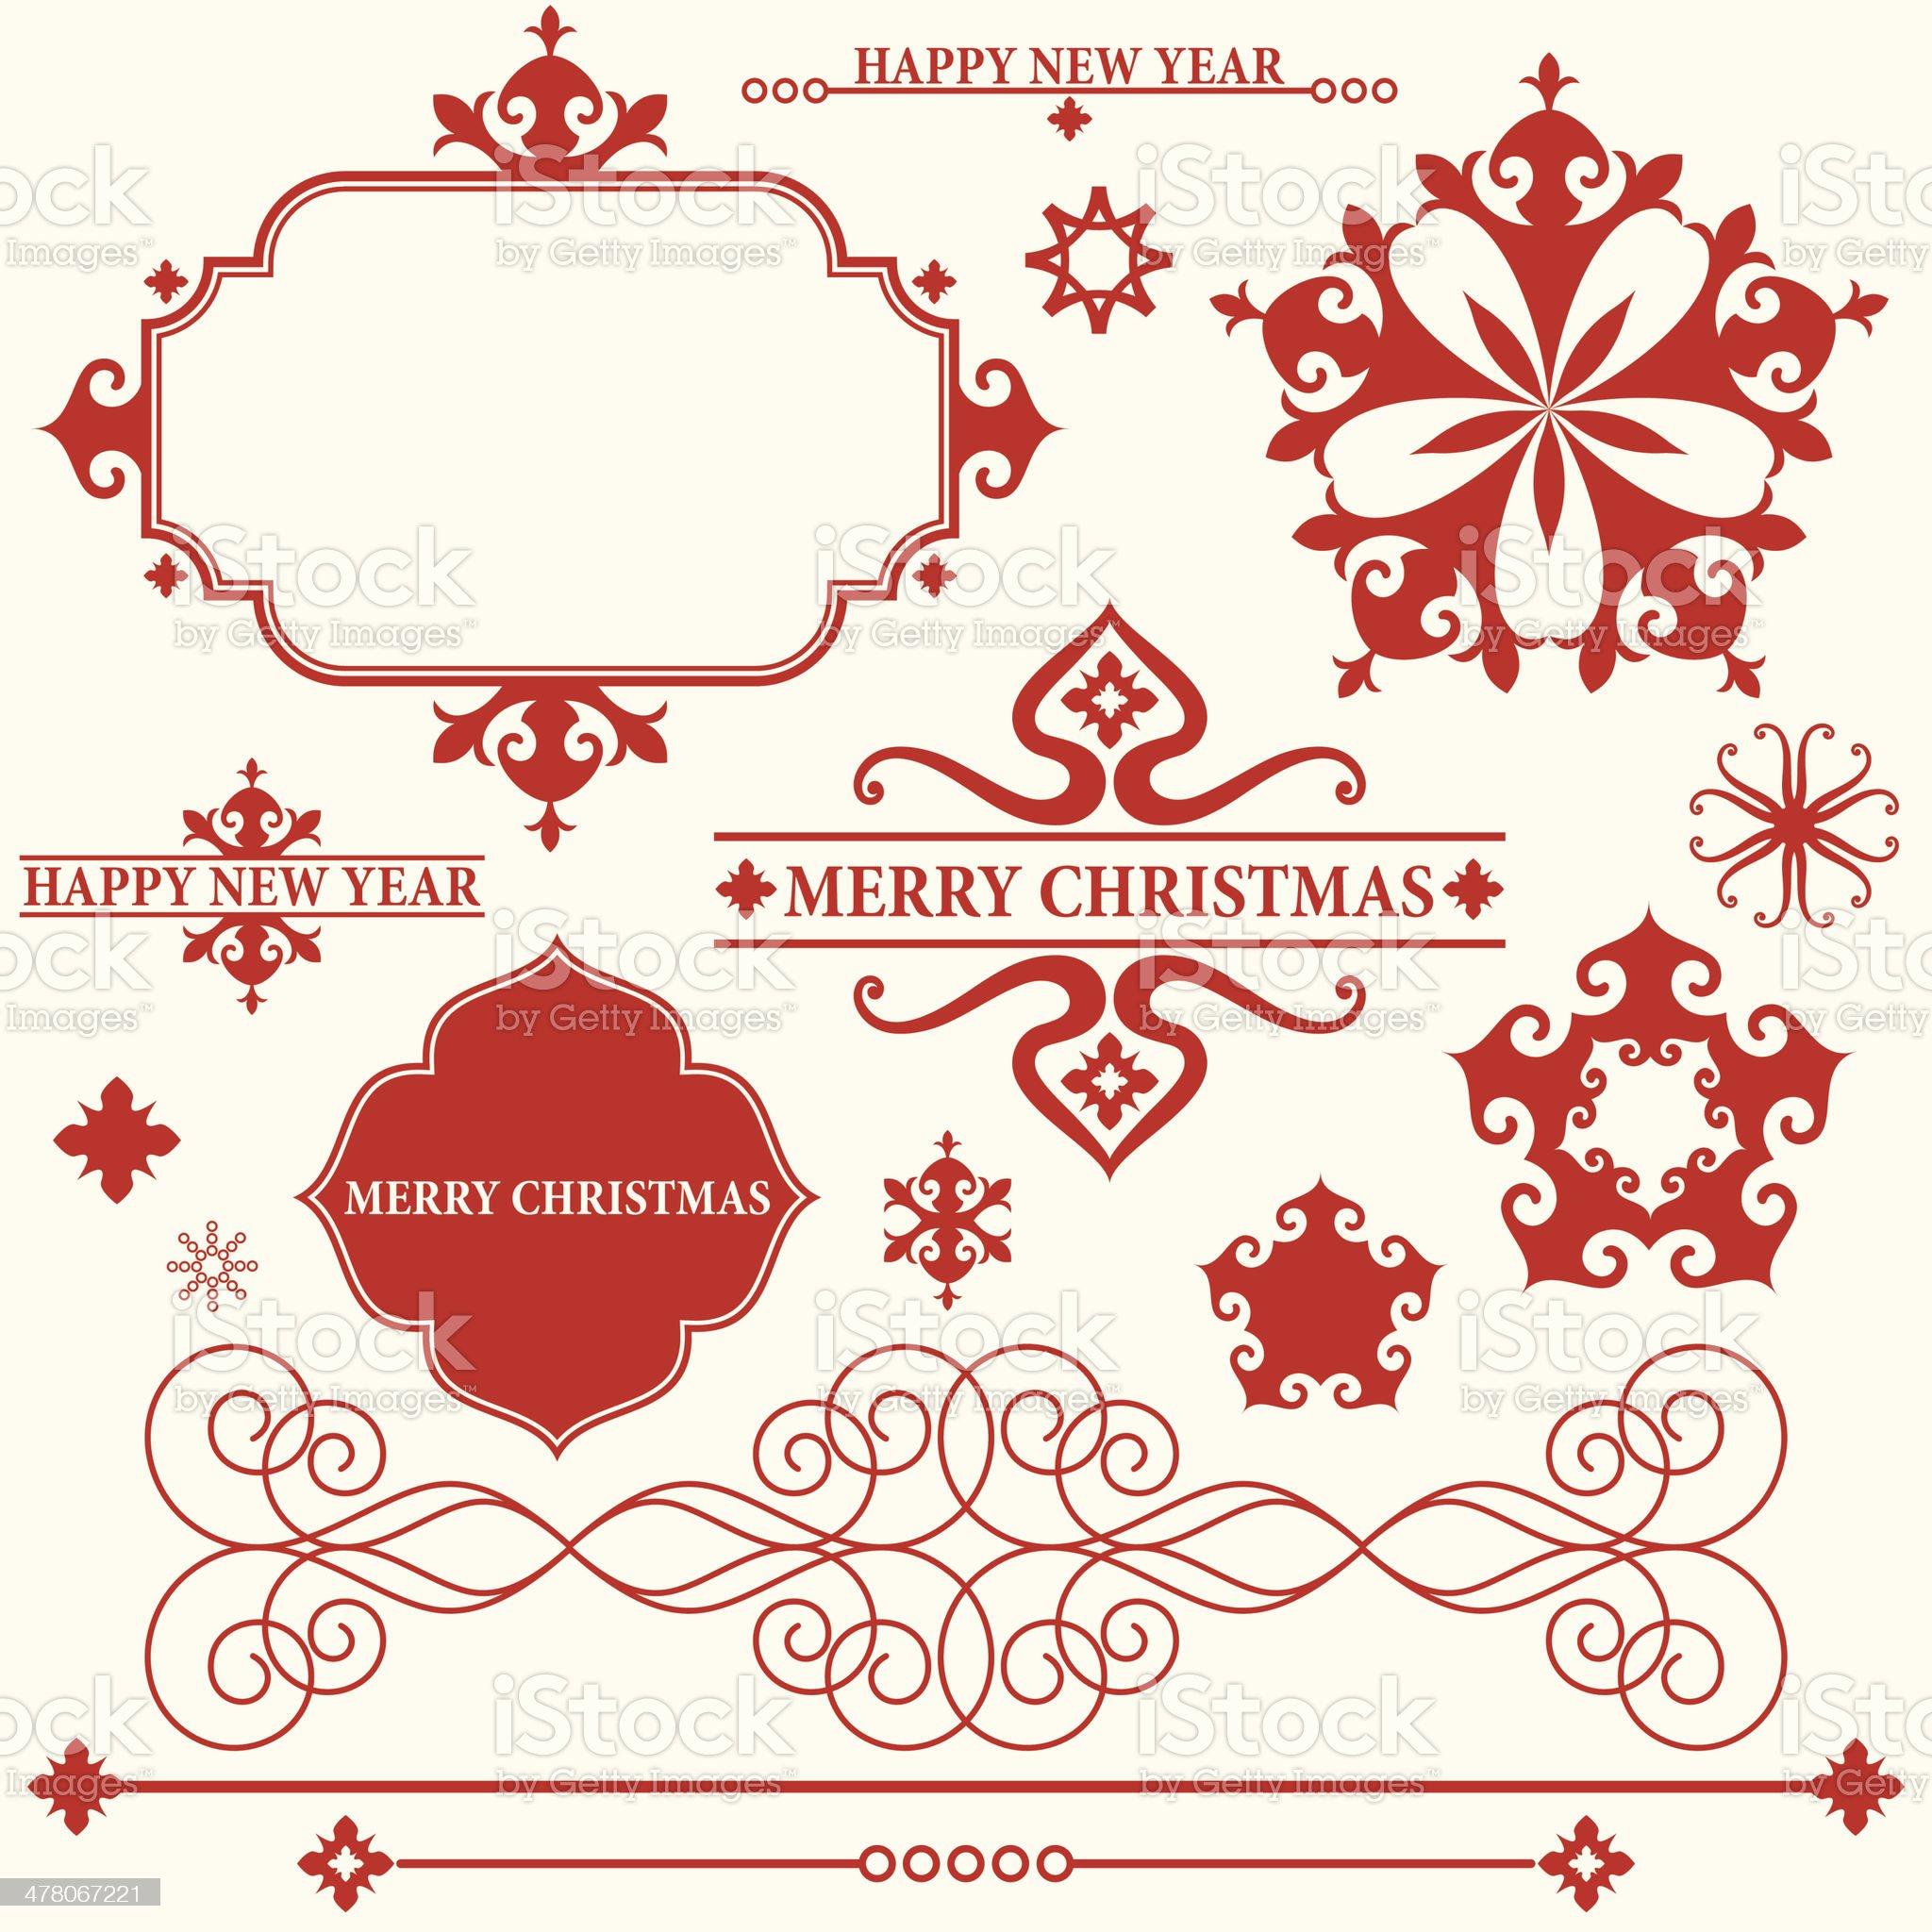 Christmas. Vintage royalty-free stock vector art